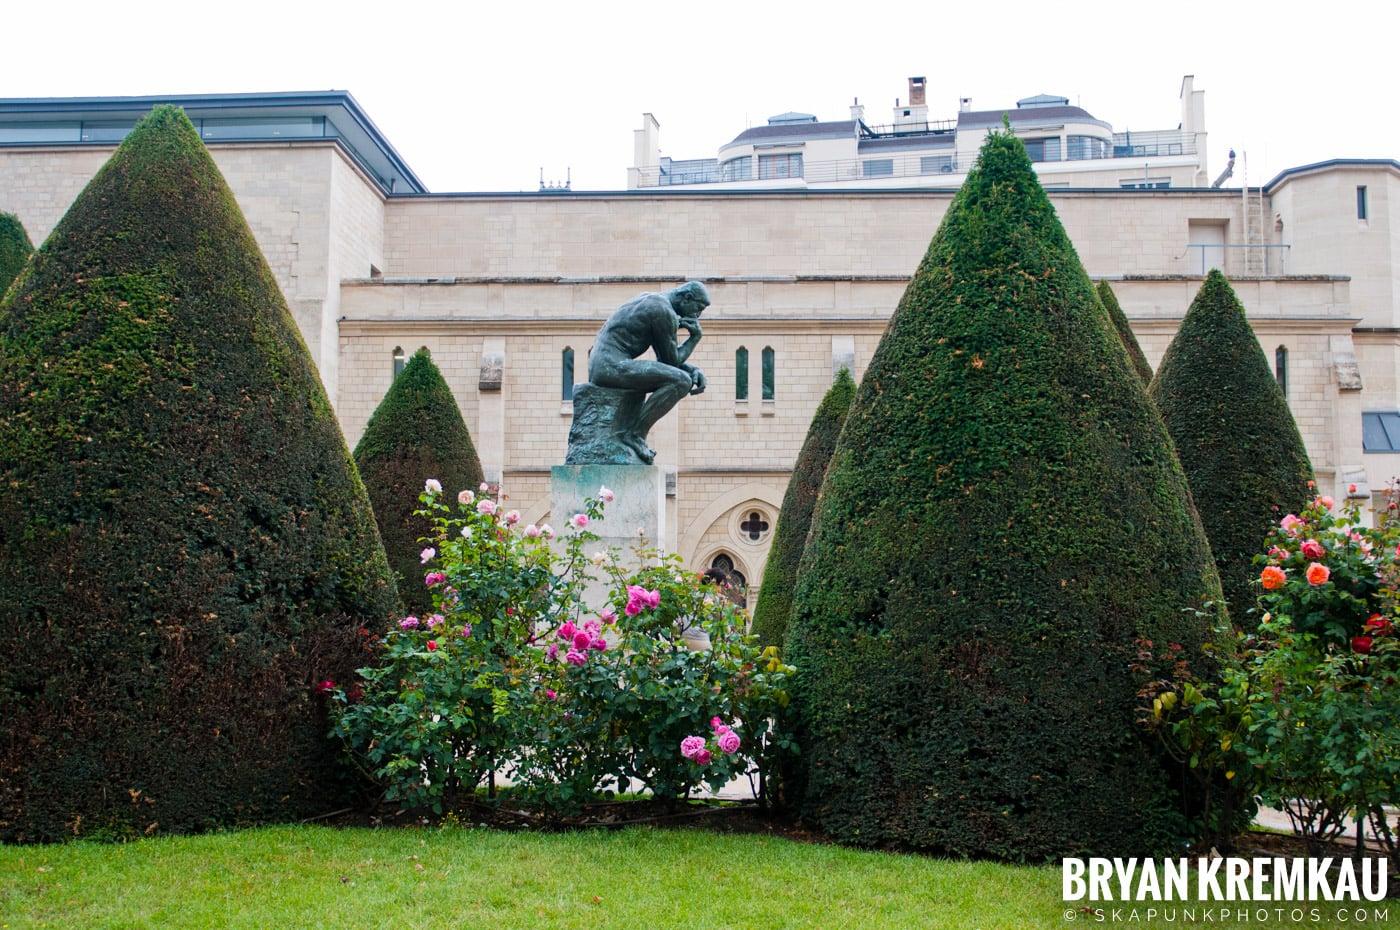 Paris, France Honeymoon - Day 4 - 7.21.11 (54)